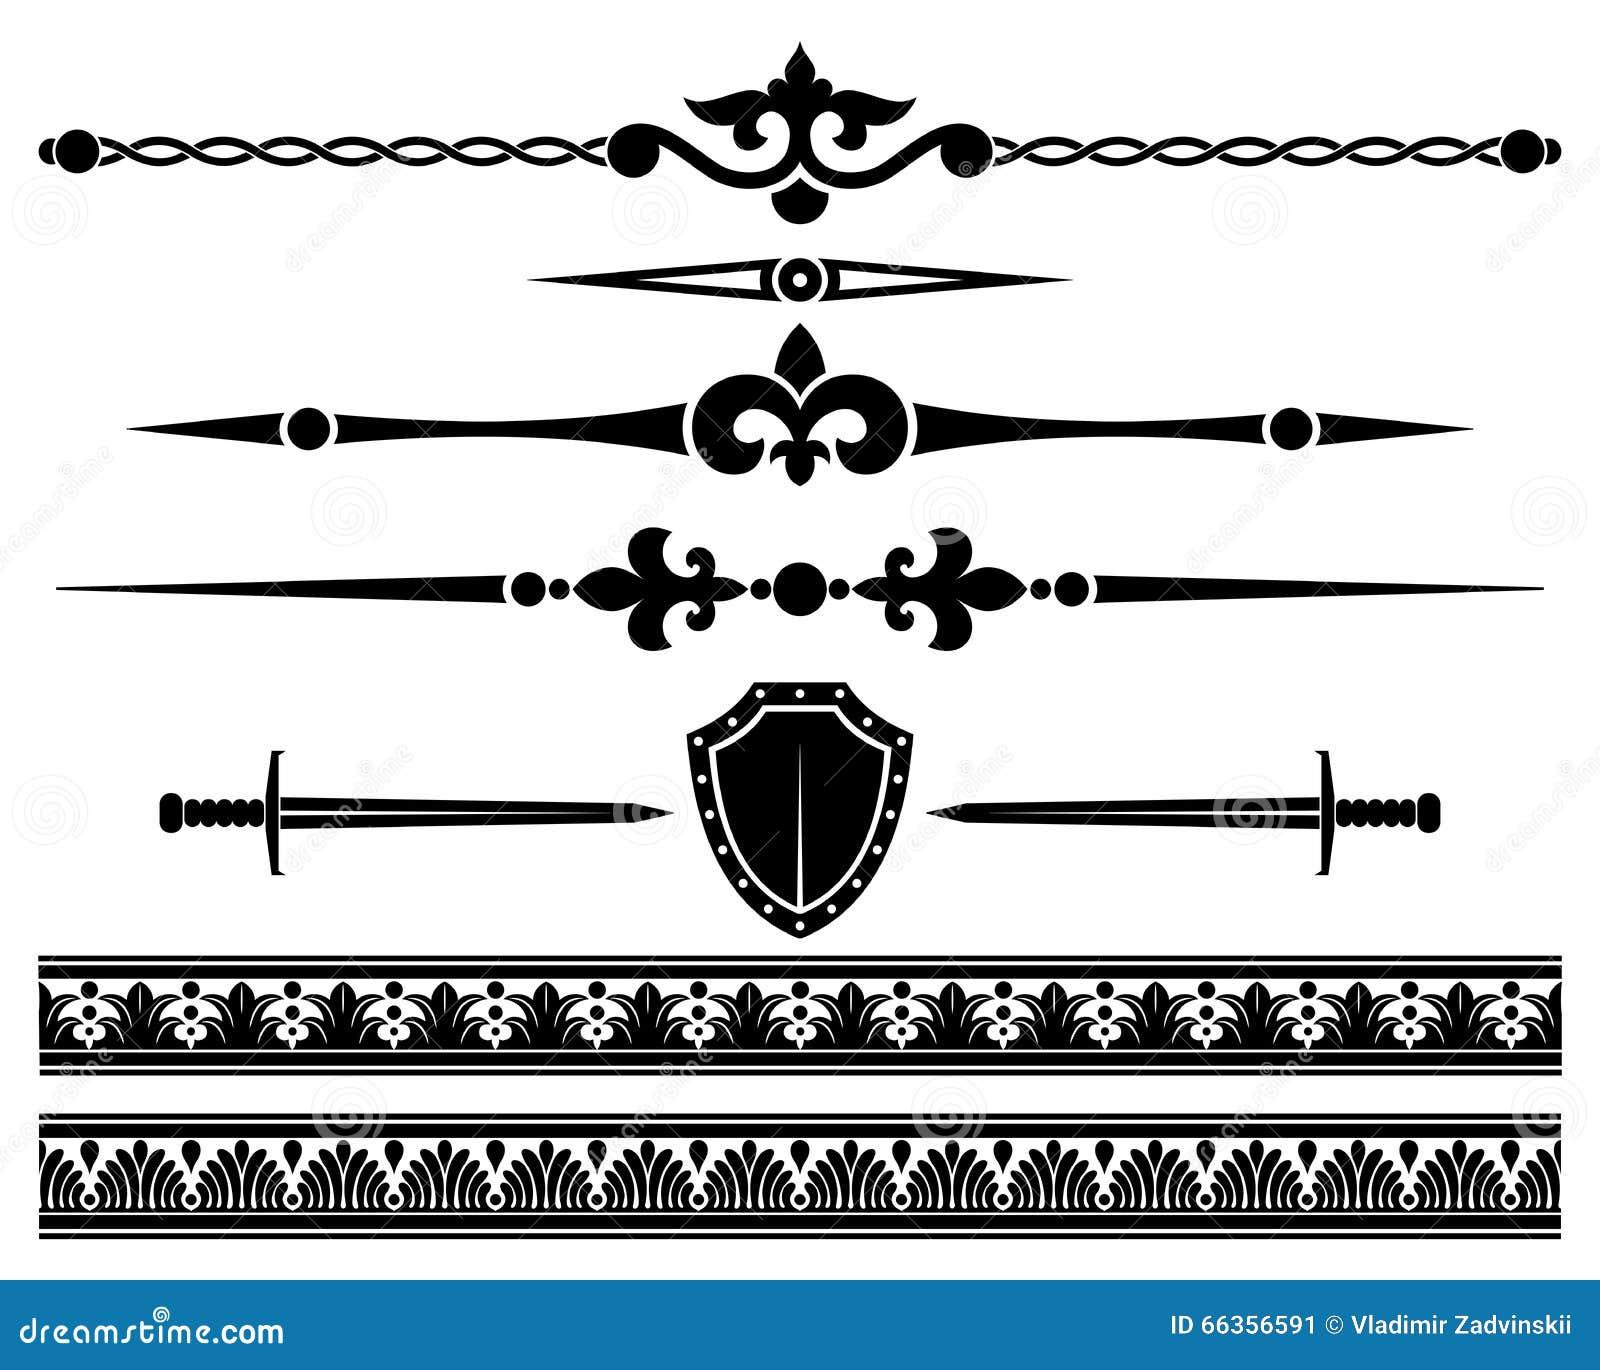 Graphic Design Elements Line : Decorative elements stock vector illustration of sword